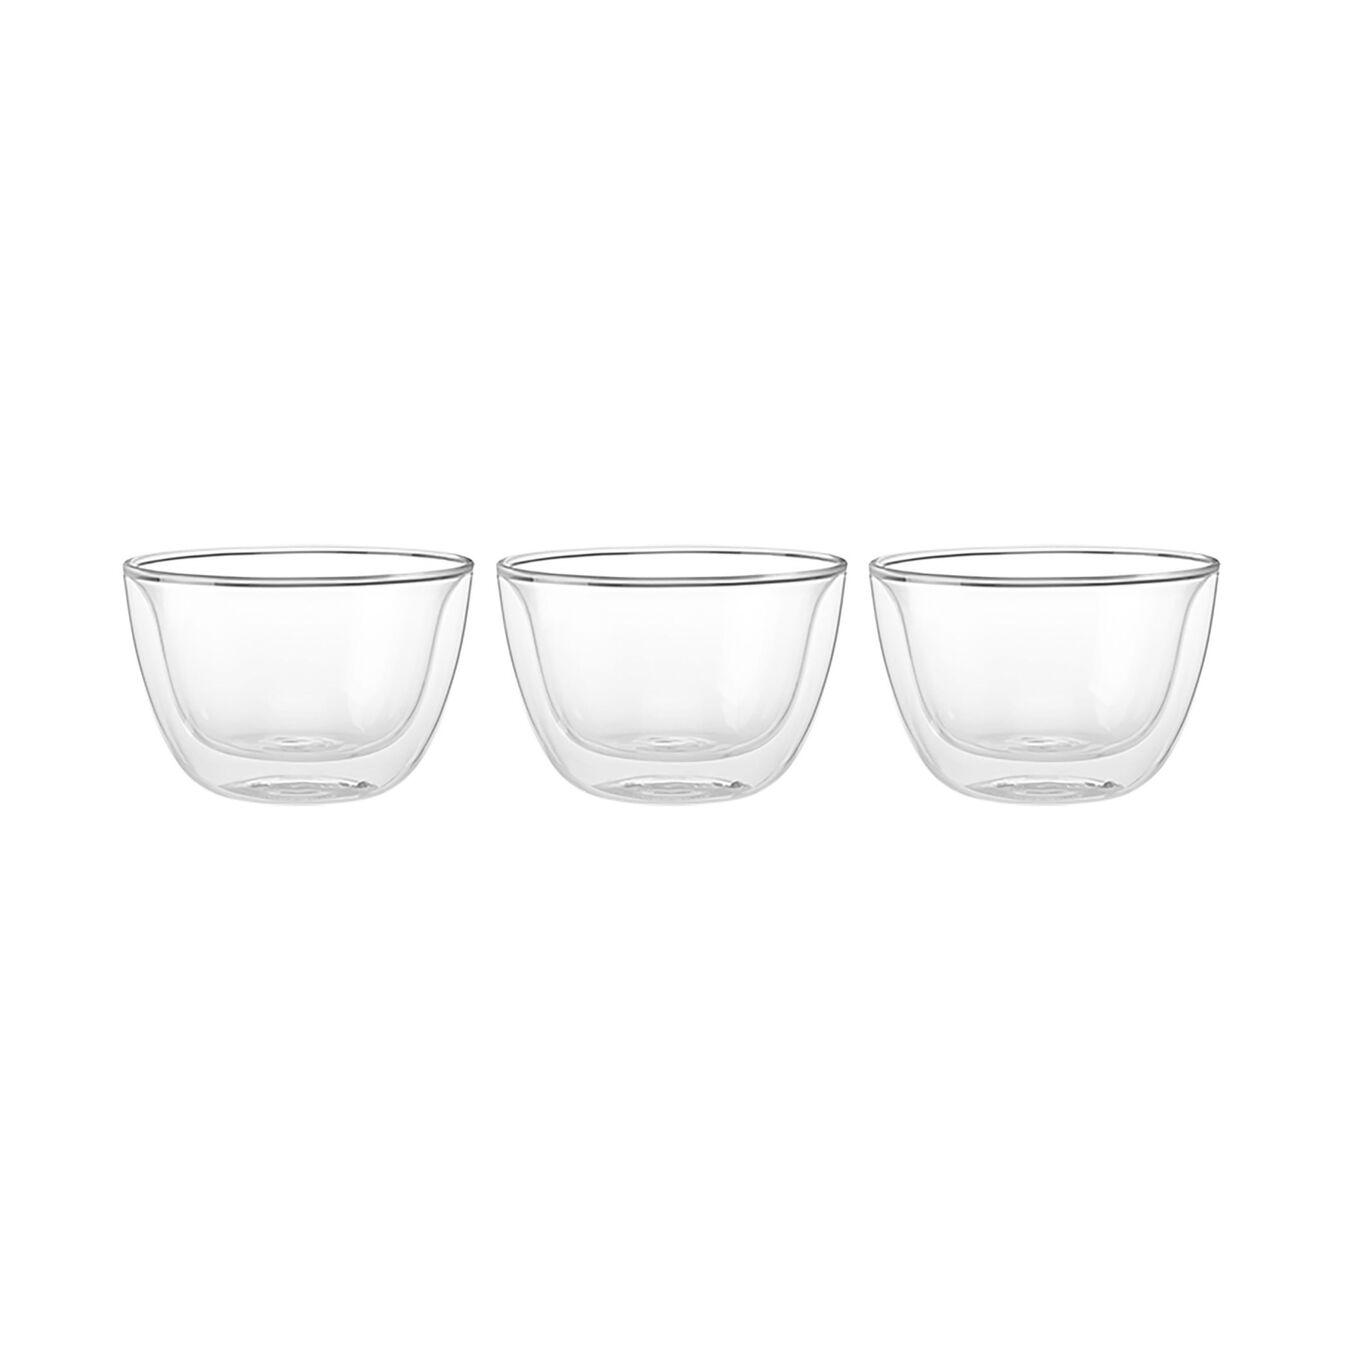 3-pc, Borosilicate glass, Appetiser set,,large 3